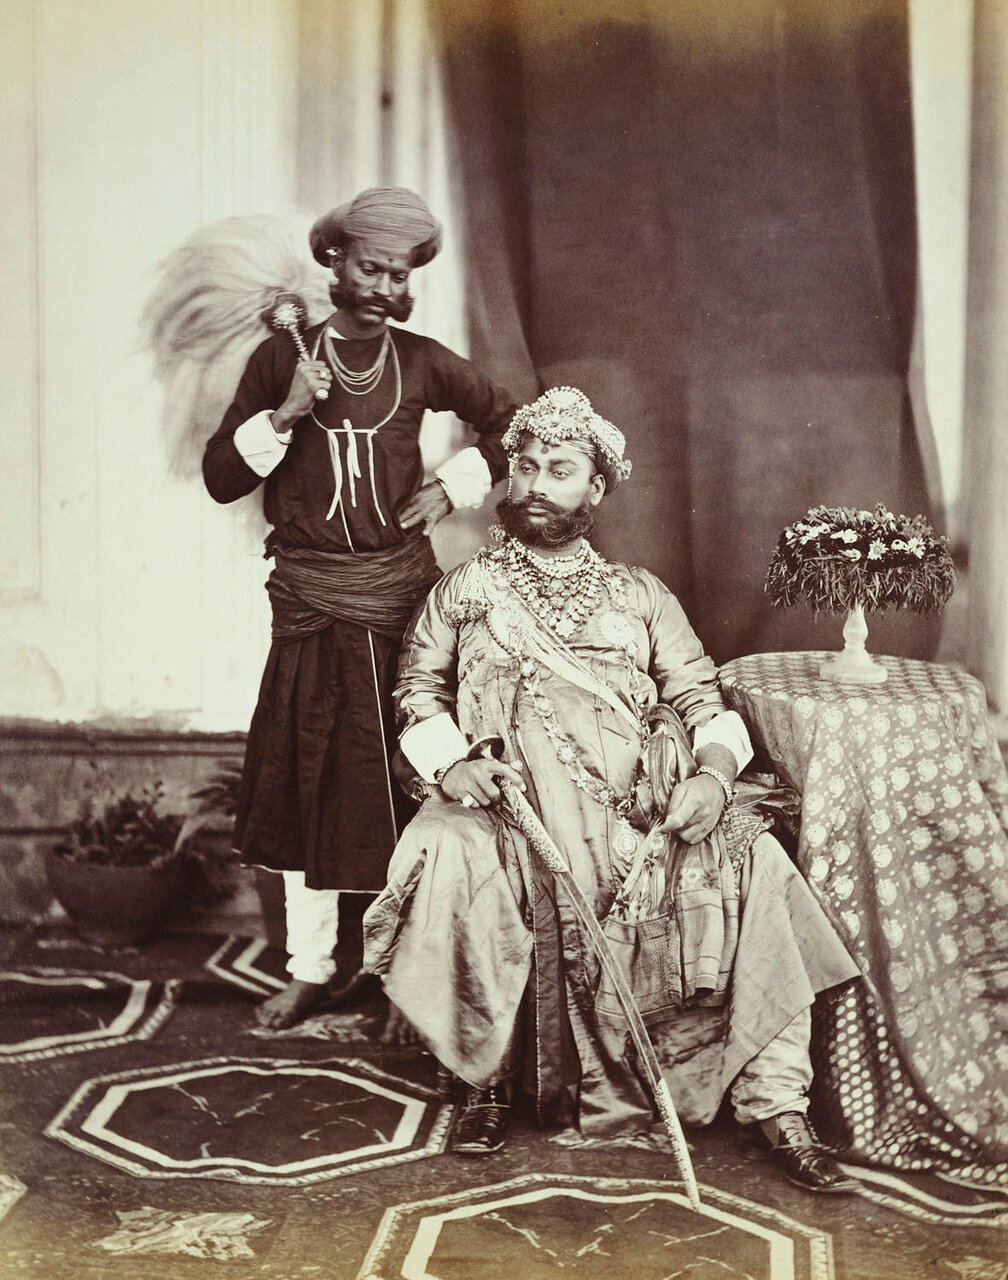 Махараджа Тукоджи Рао Холкар II (1835-86) из княжества Индаура